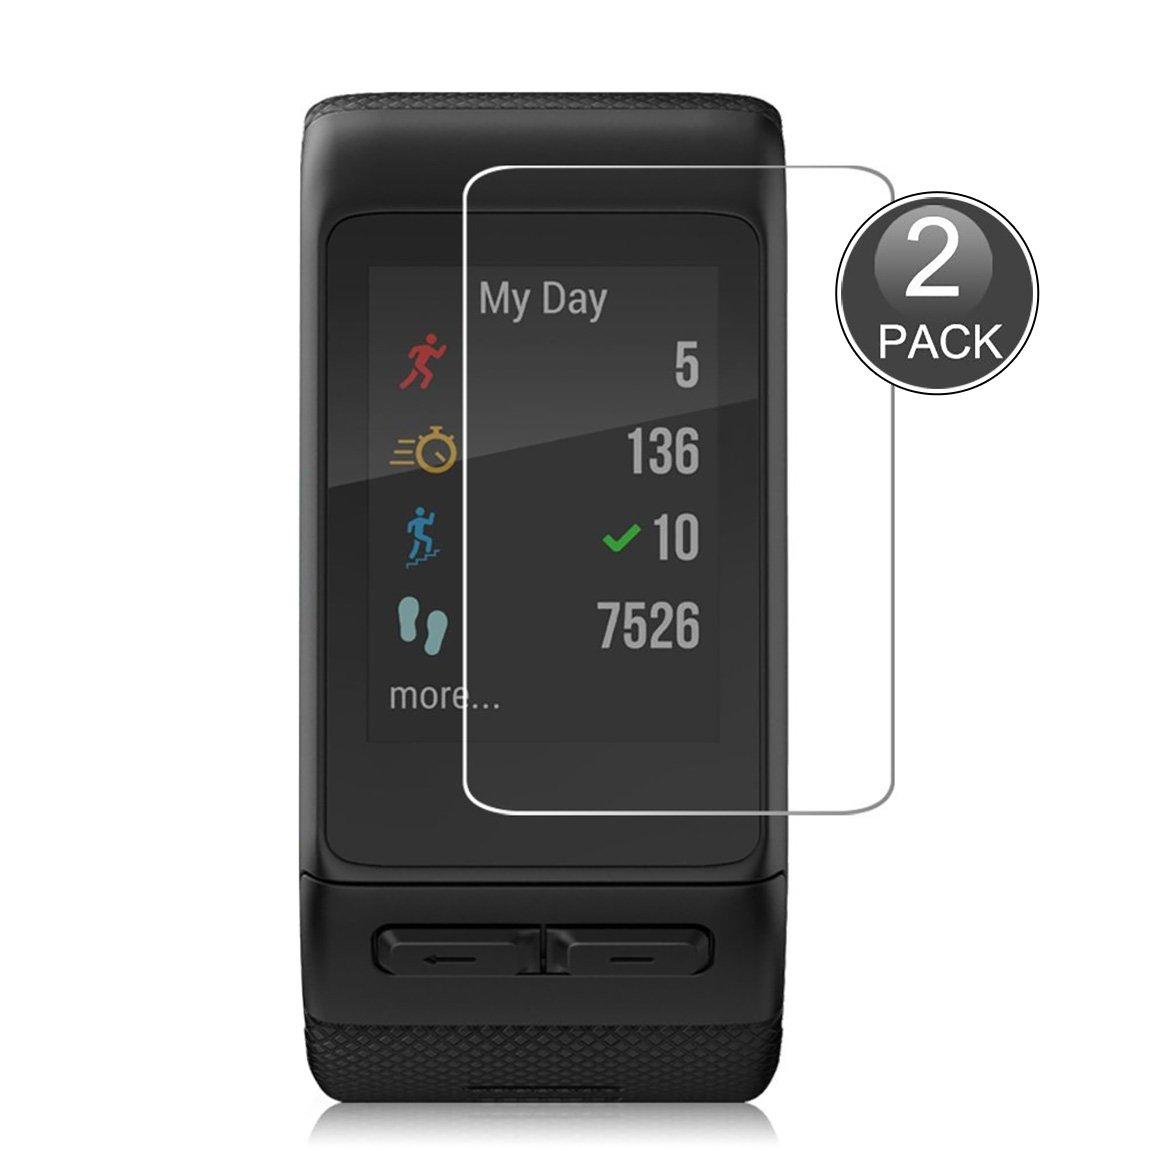 E-Hamii [2-Pack] Garmin Vivoactive Protector de Pantalla, 0.26mm HD Anti-Scratch y Anti-huella digital Proteger la pelí cula, 9H Vidrio templado Cubierta protectora, Mejor protecció n Mejor protección H165